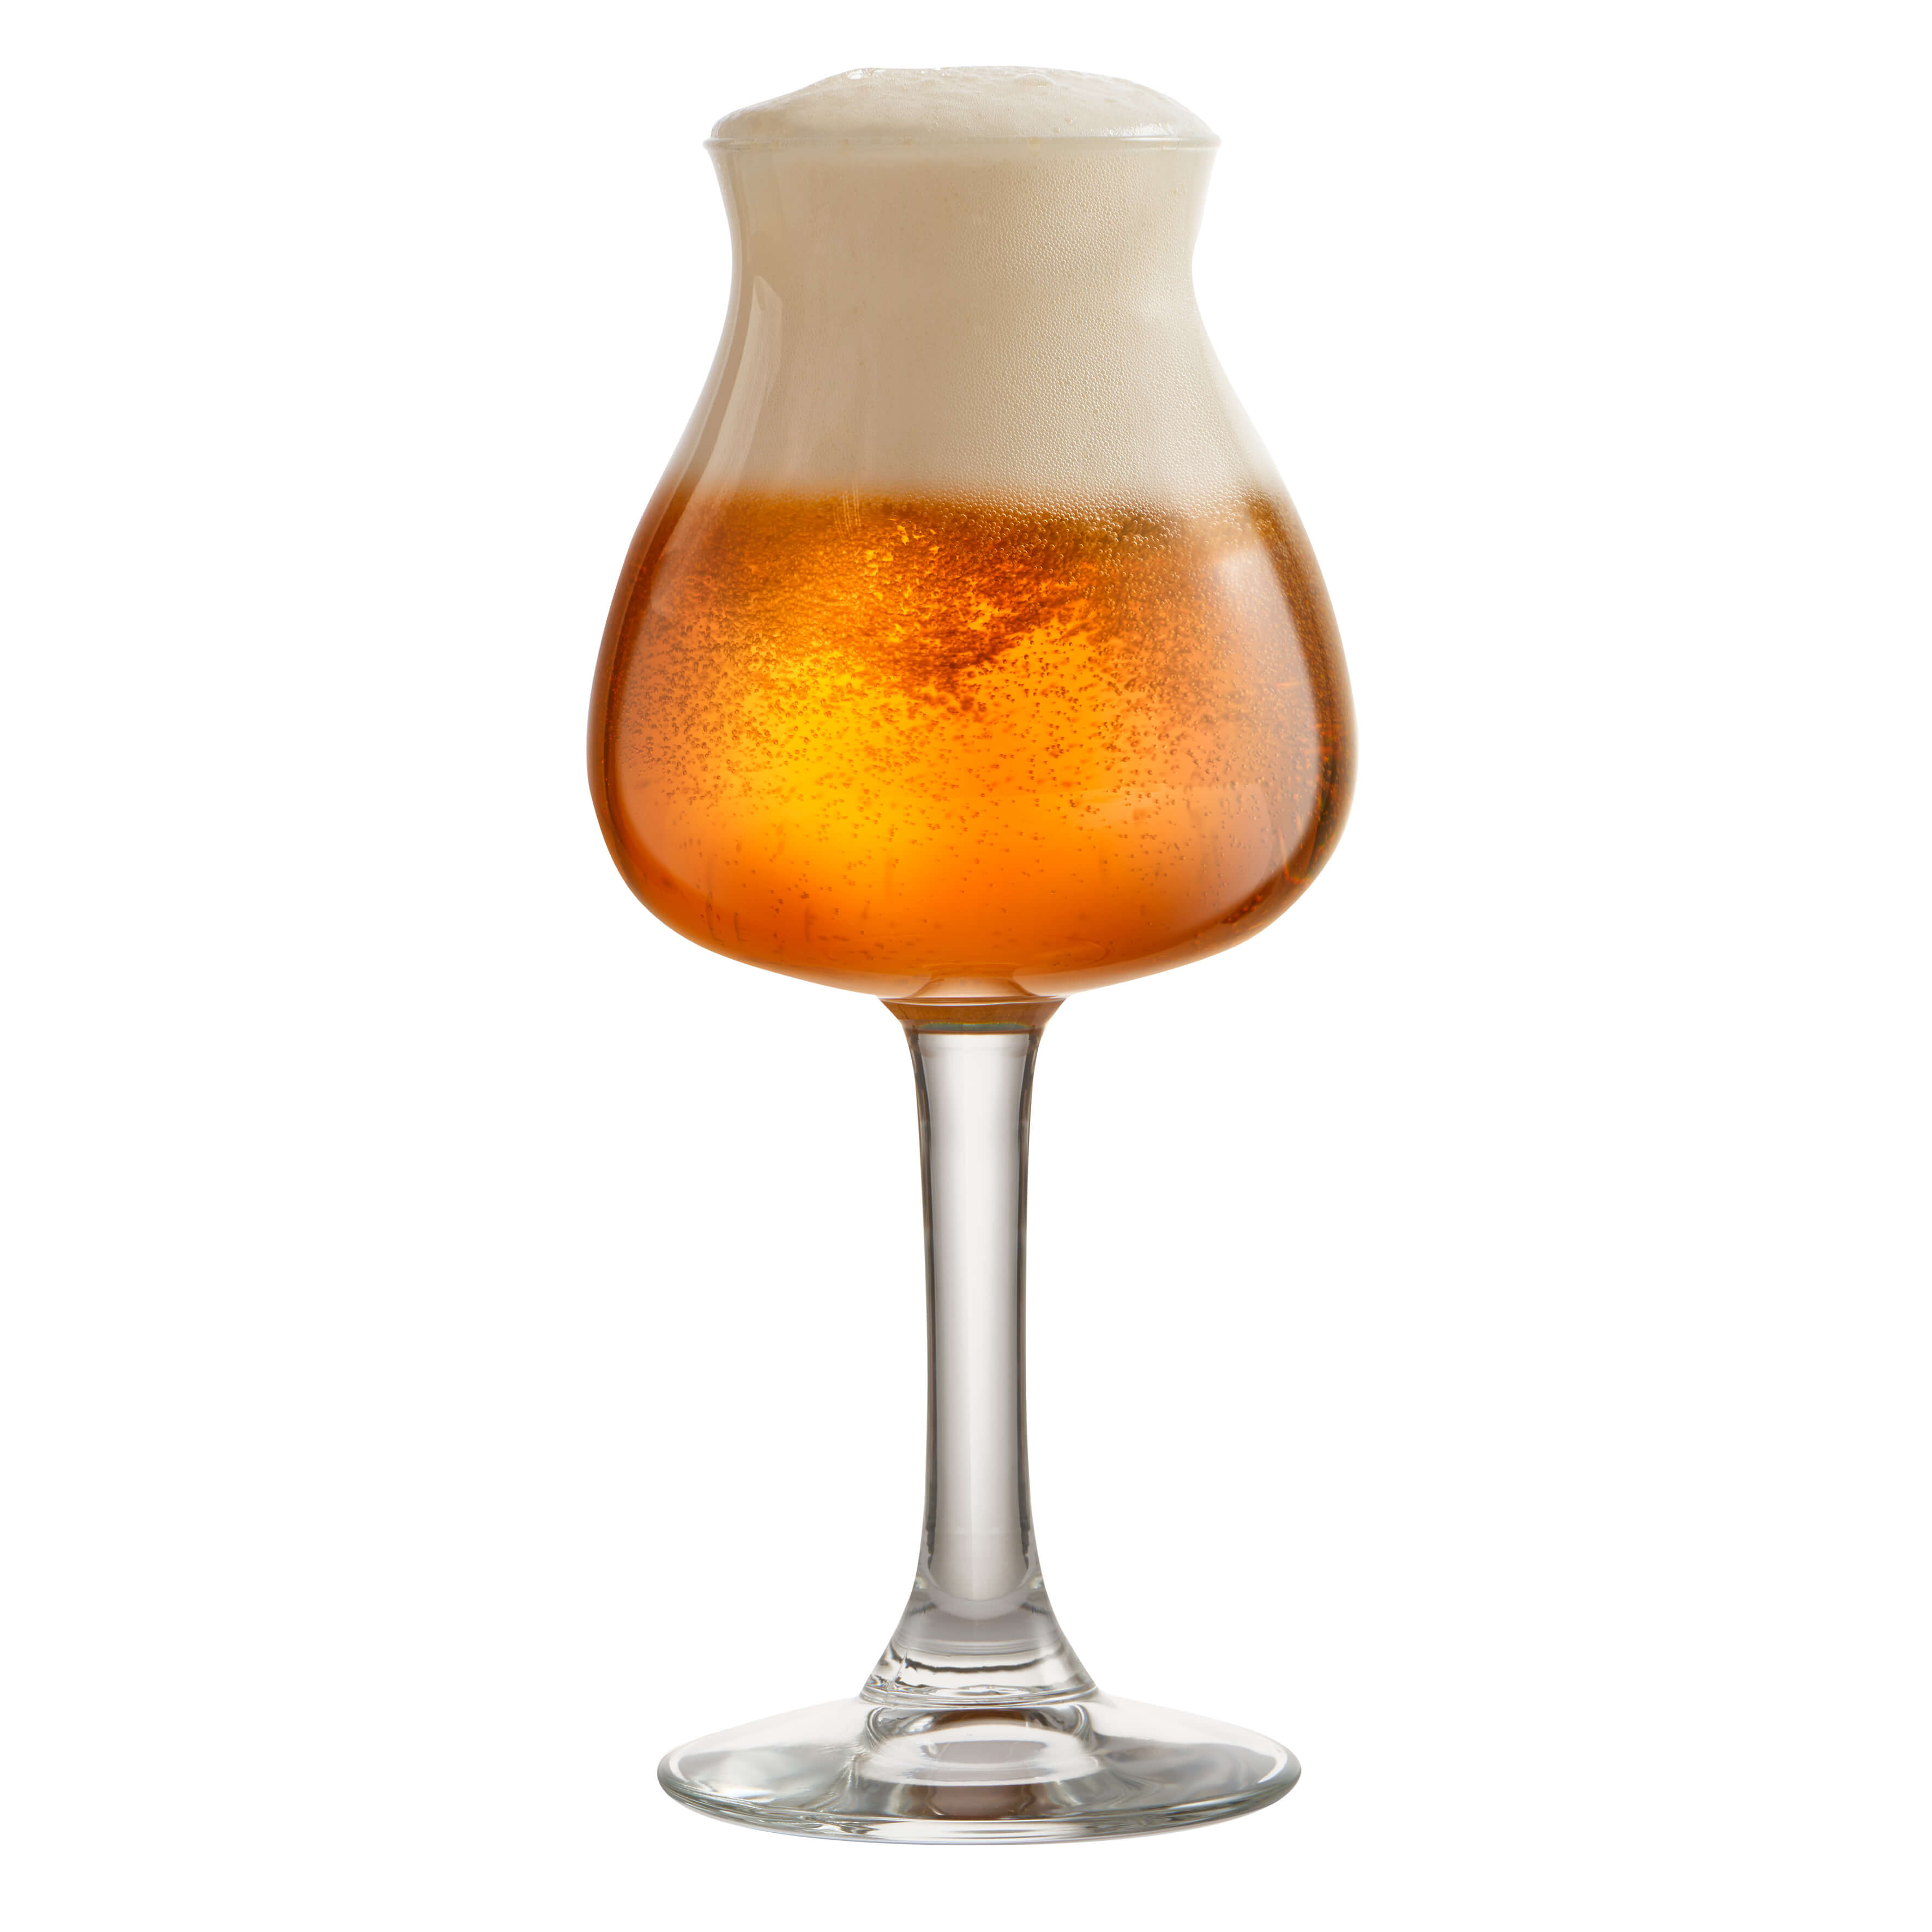 AnDer 2.0 Tall Stem Beer - 41 cl